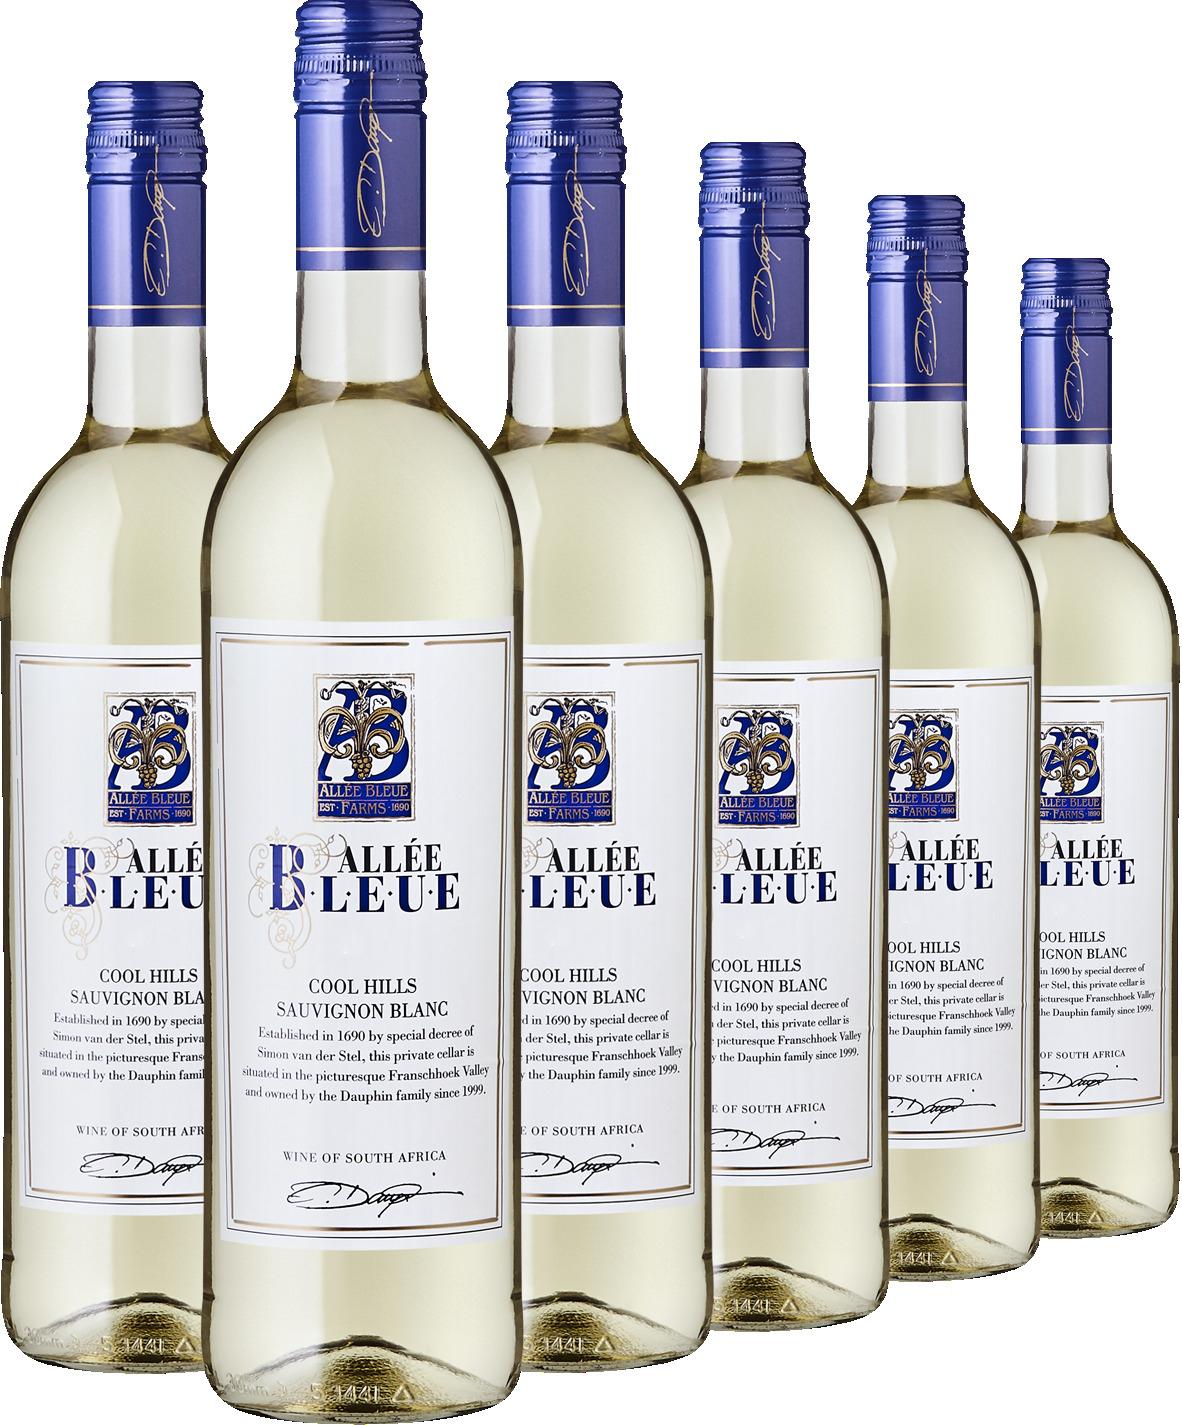 Cool Hills Sauvignon Blanc 2020